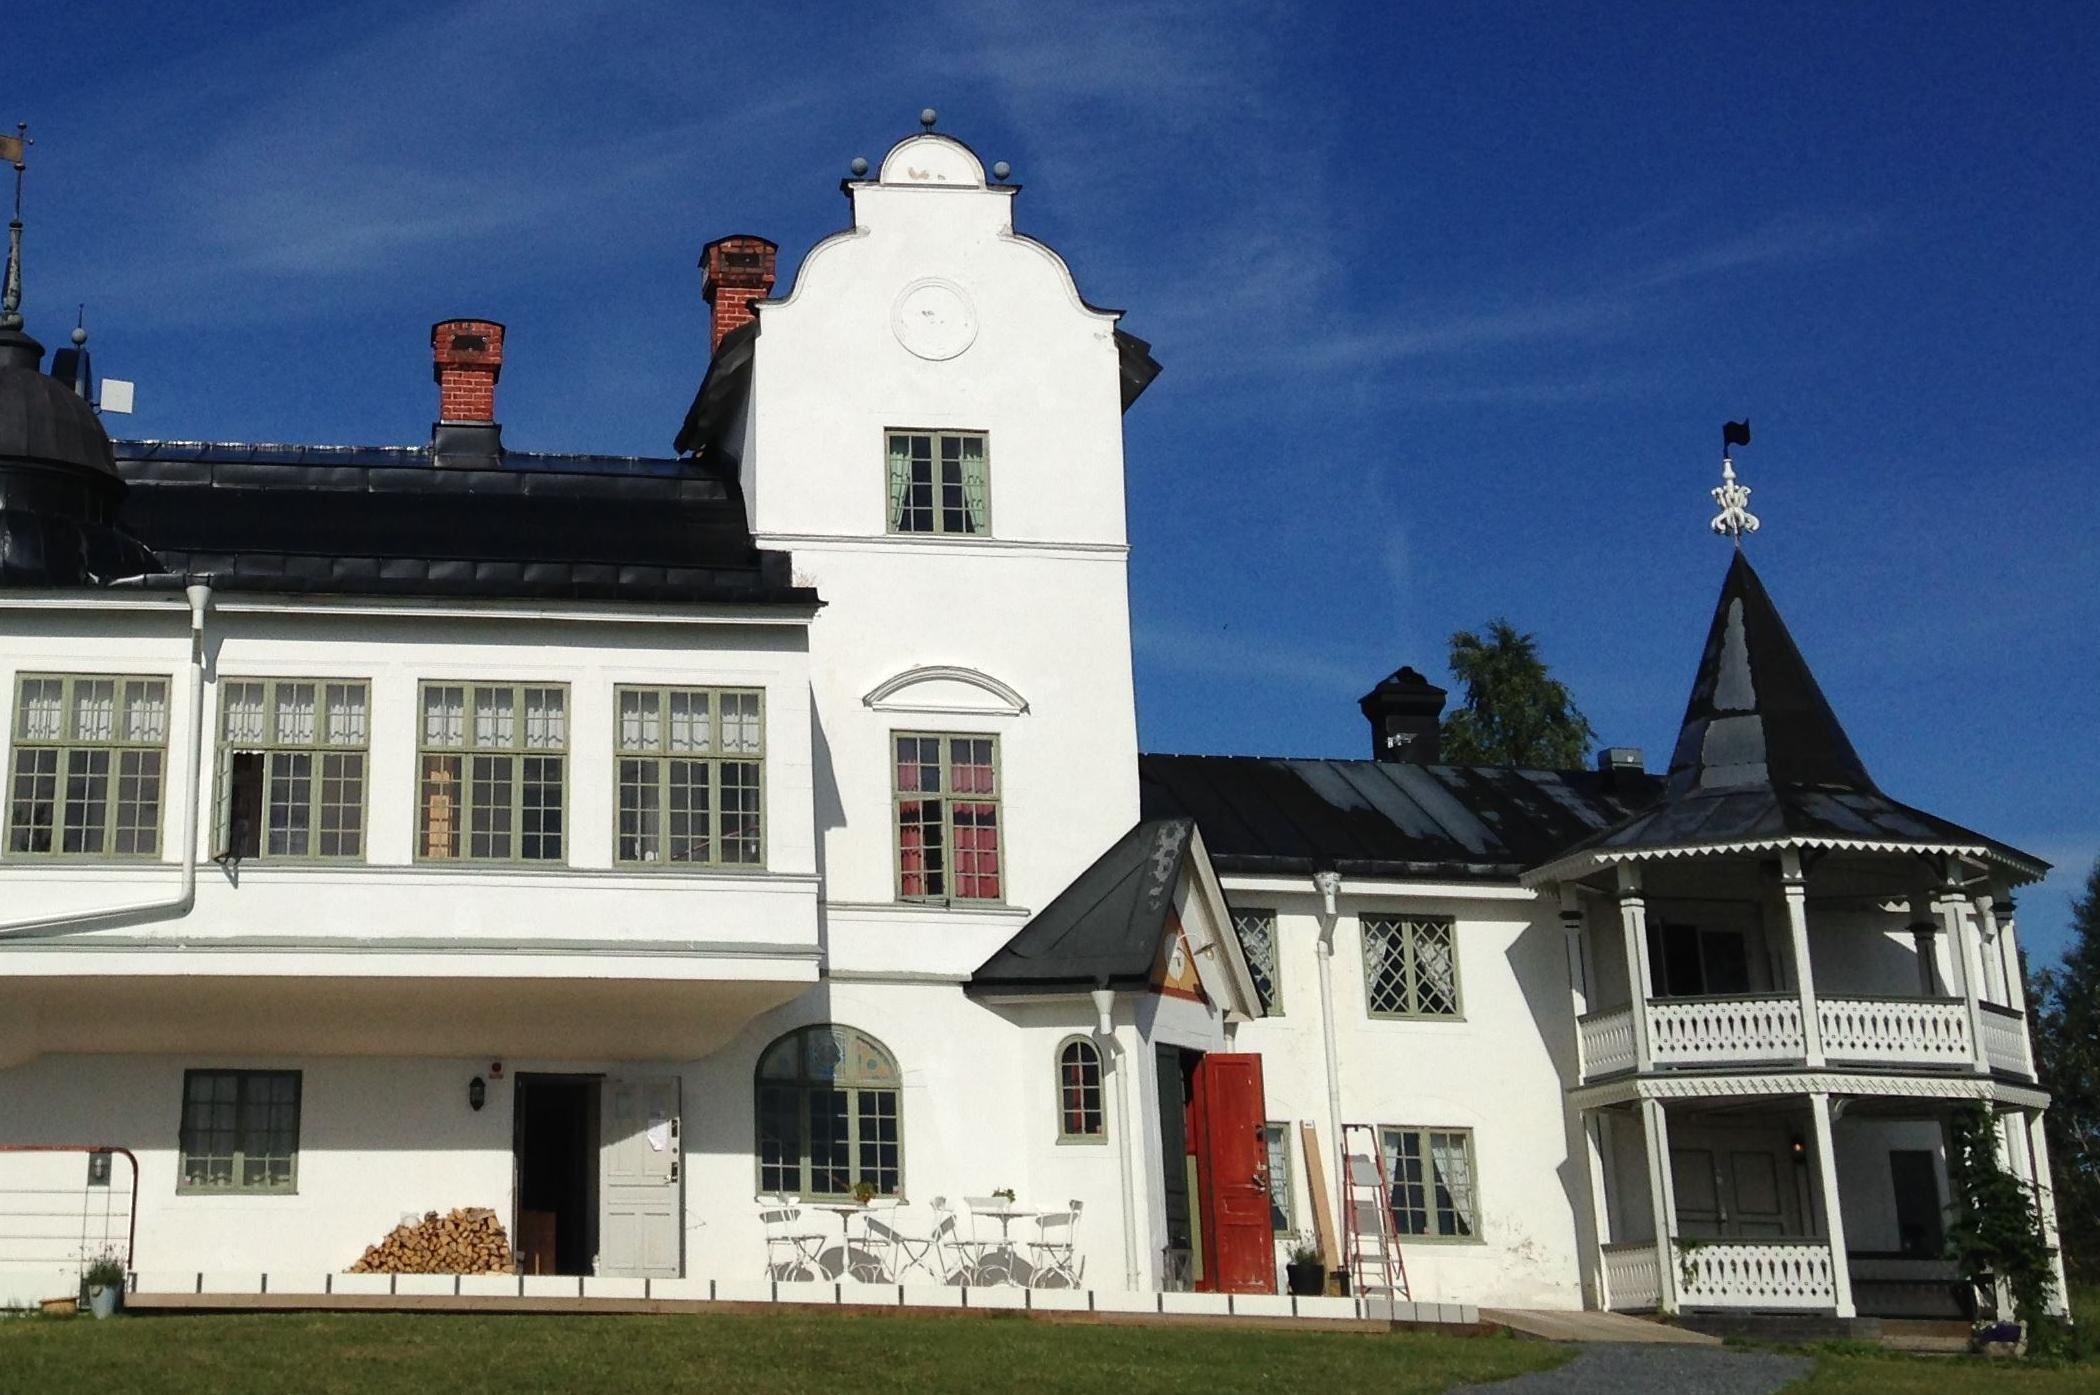 Foto: Verkö slott,  © Copy: Verkö Slott, Verkö Slott